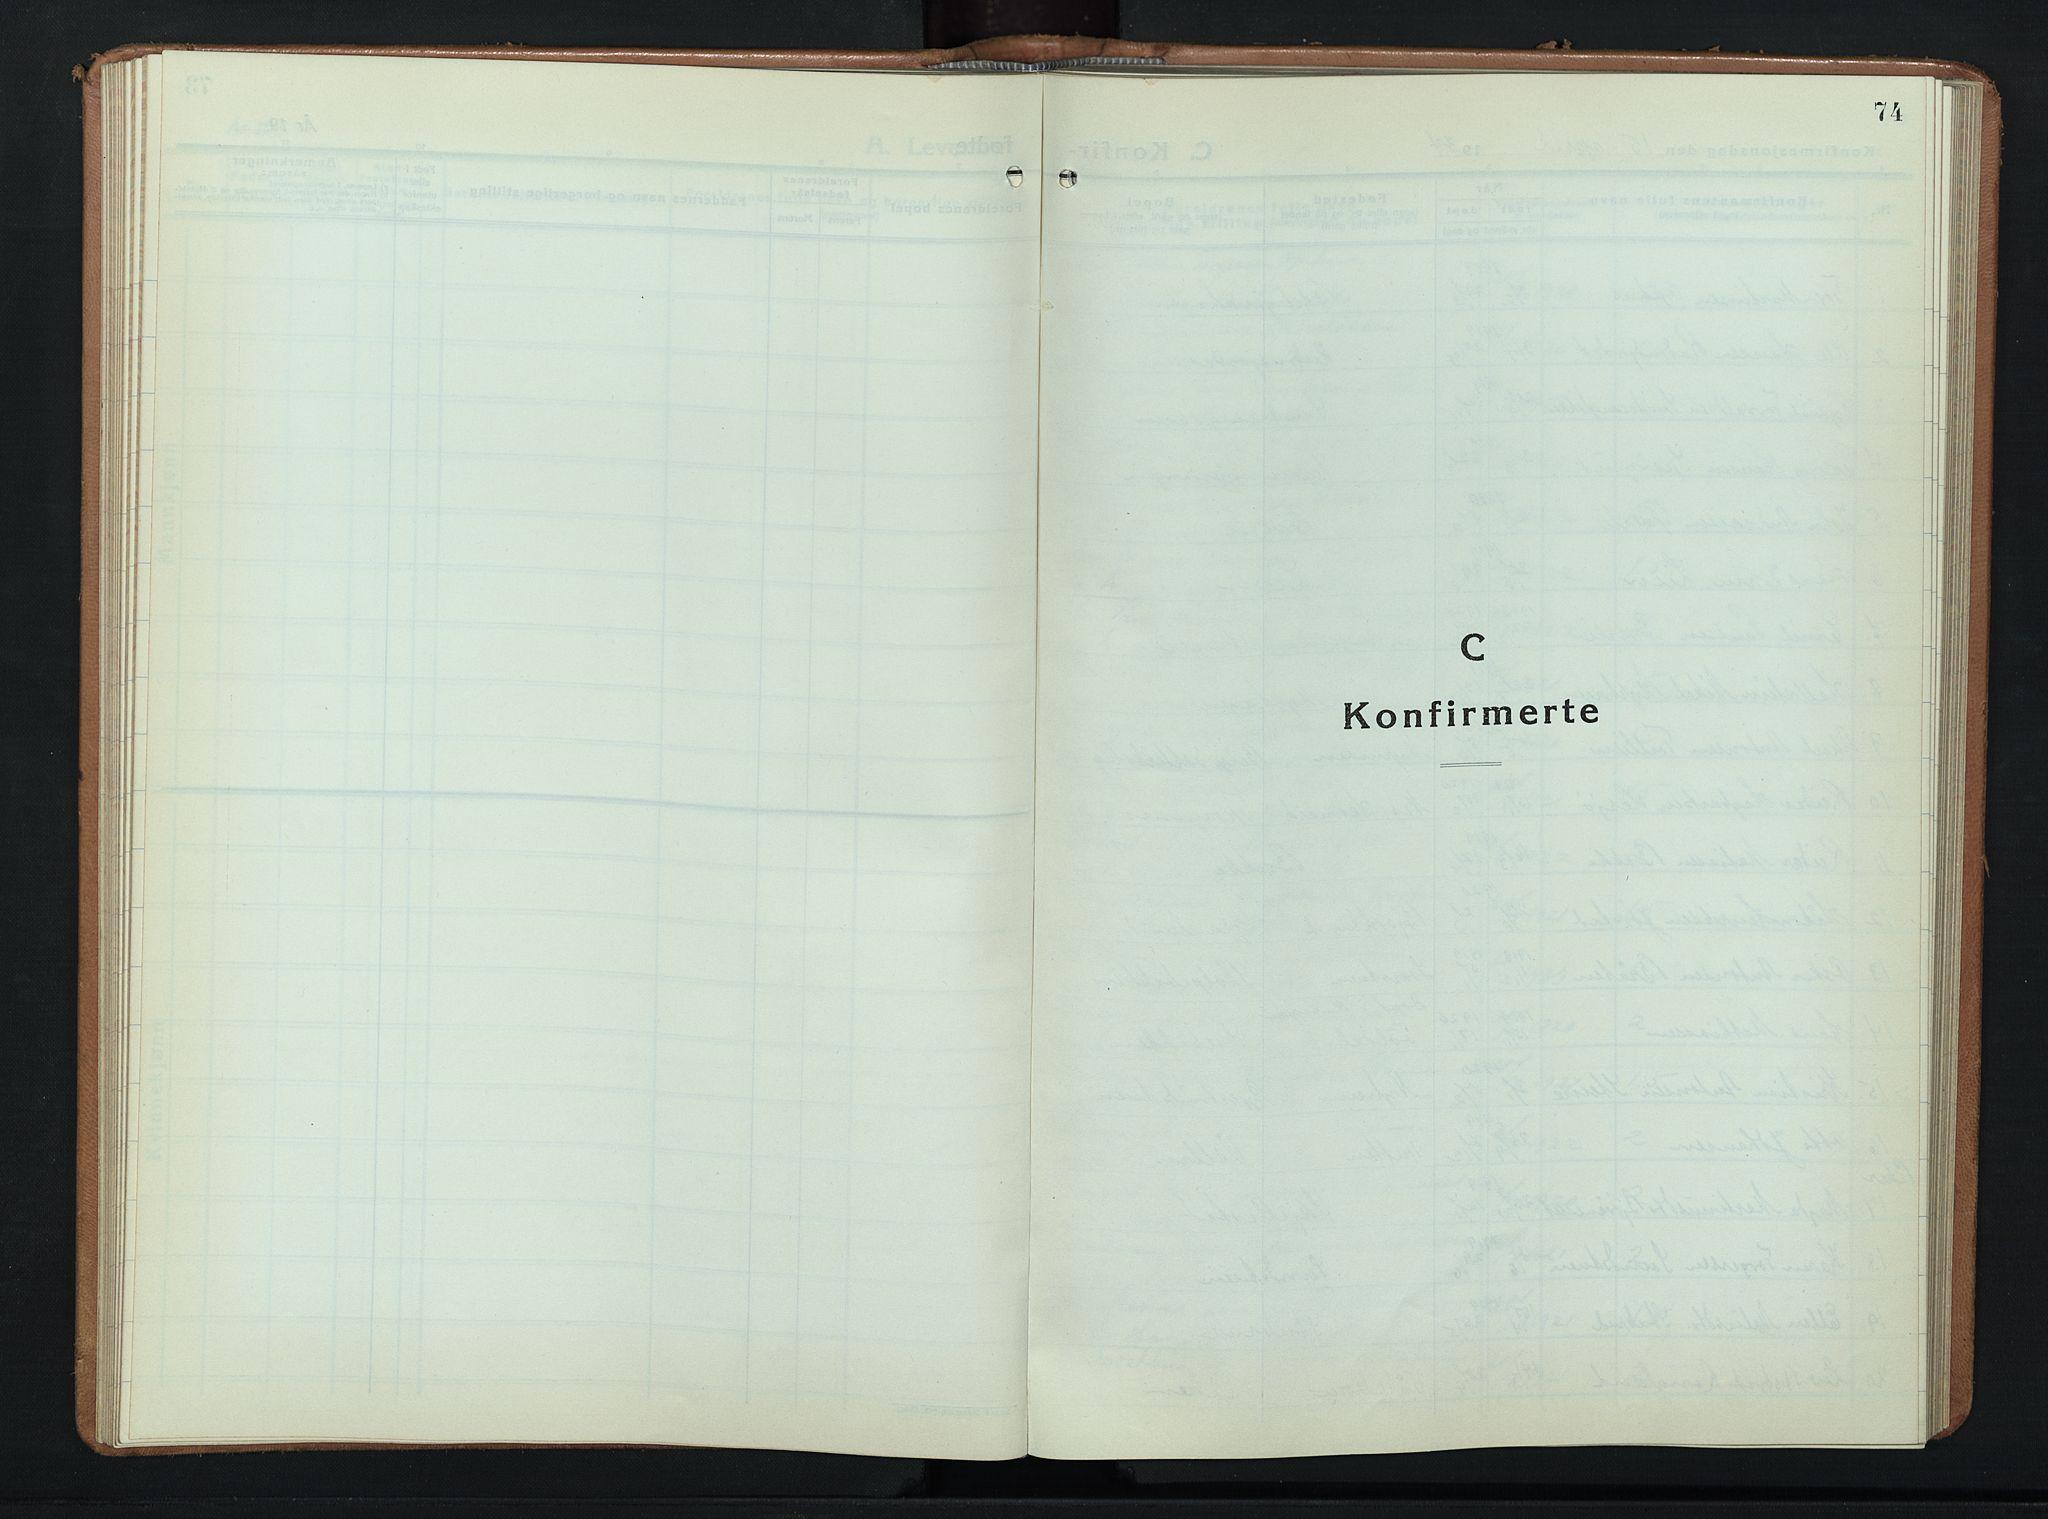 SAH, Ringebu prestekontor, Klokkerbok nr. 12, 1934-1949, s. 74